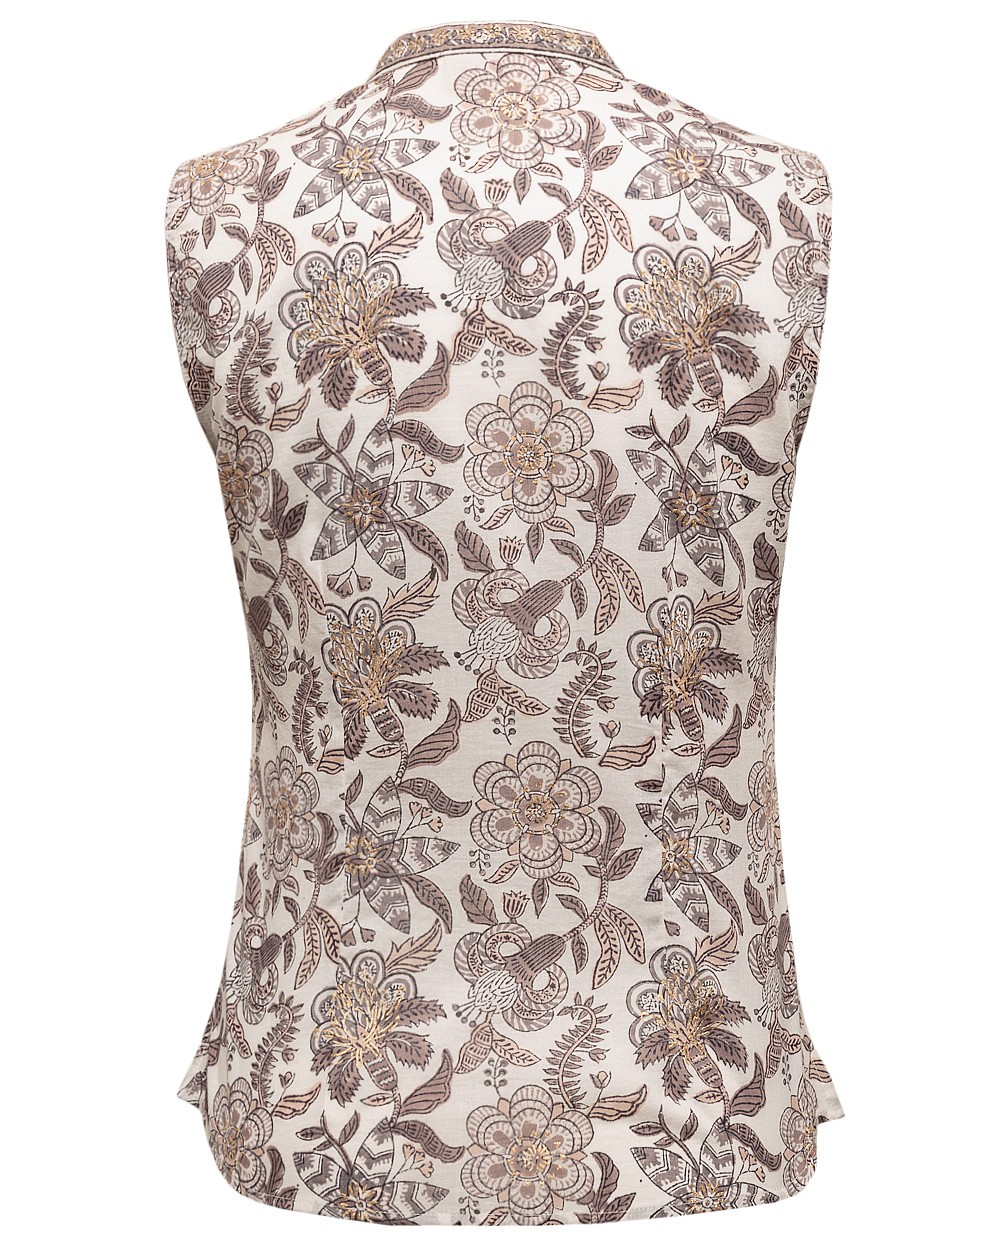 New East Womens Casual Sleveless Shirt Cotton Nehru Collar Deep V-Neckline White